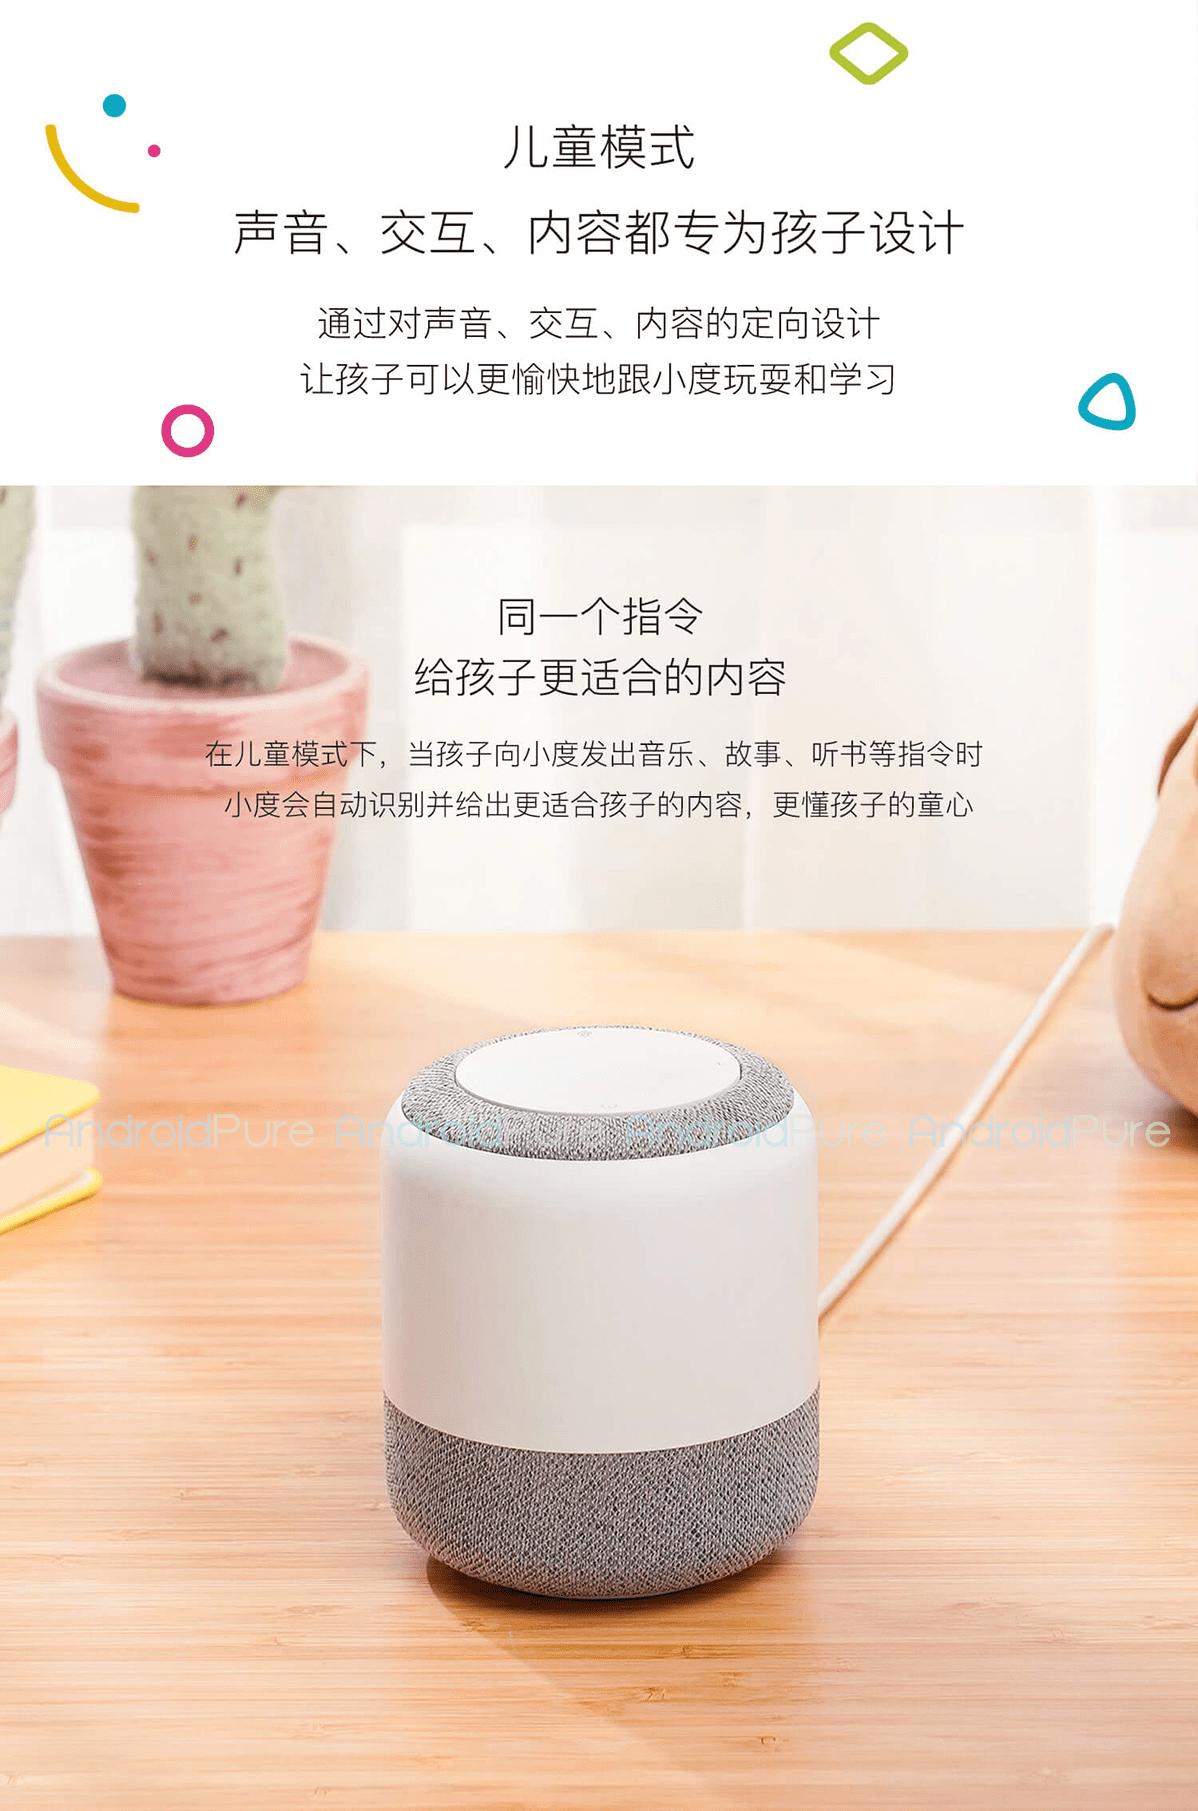 Motorola Smart AI